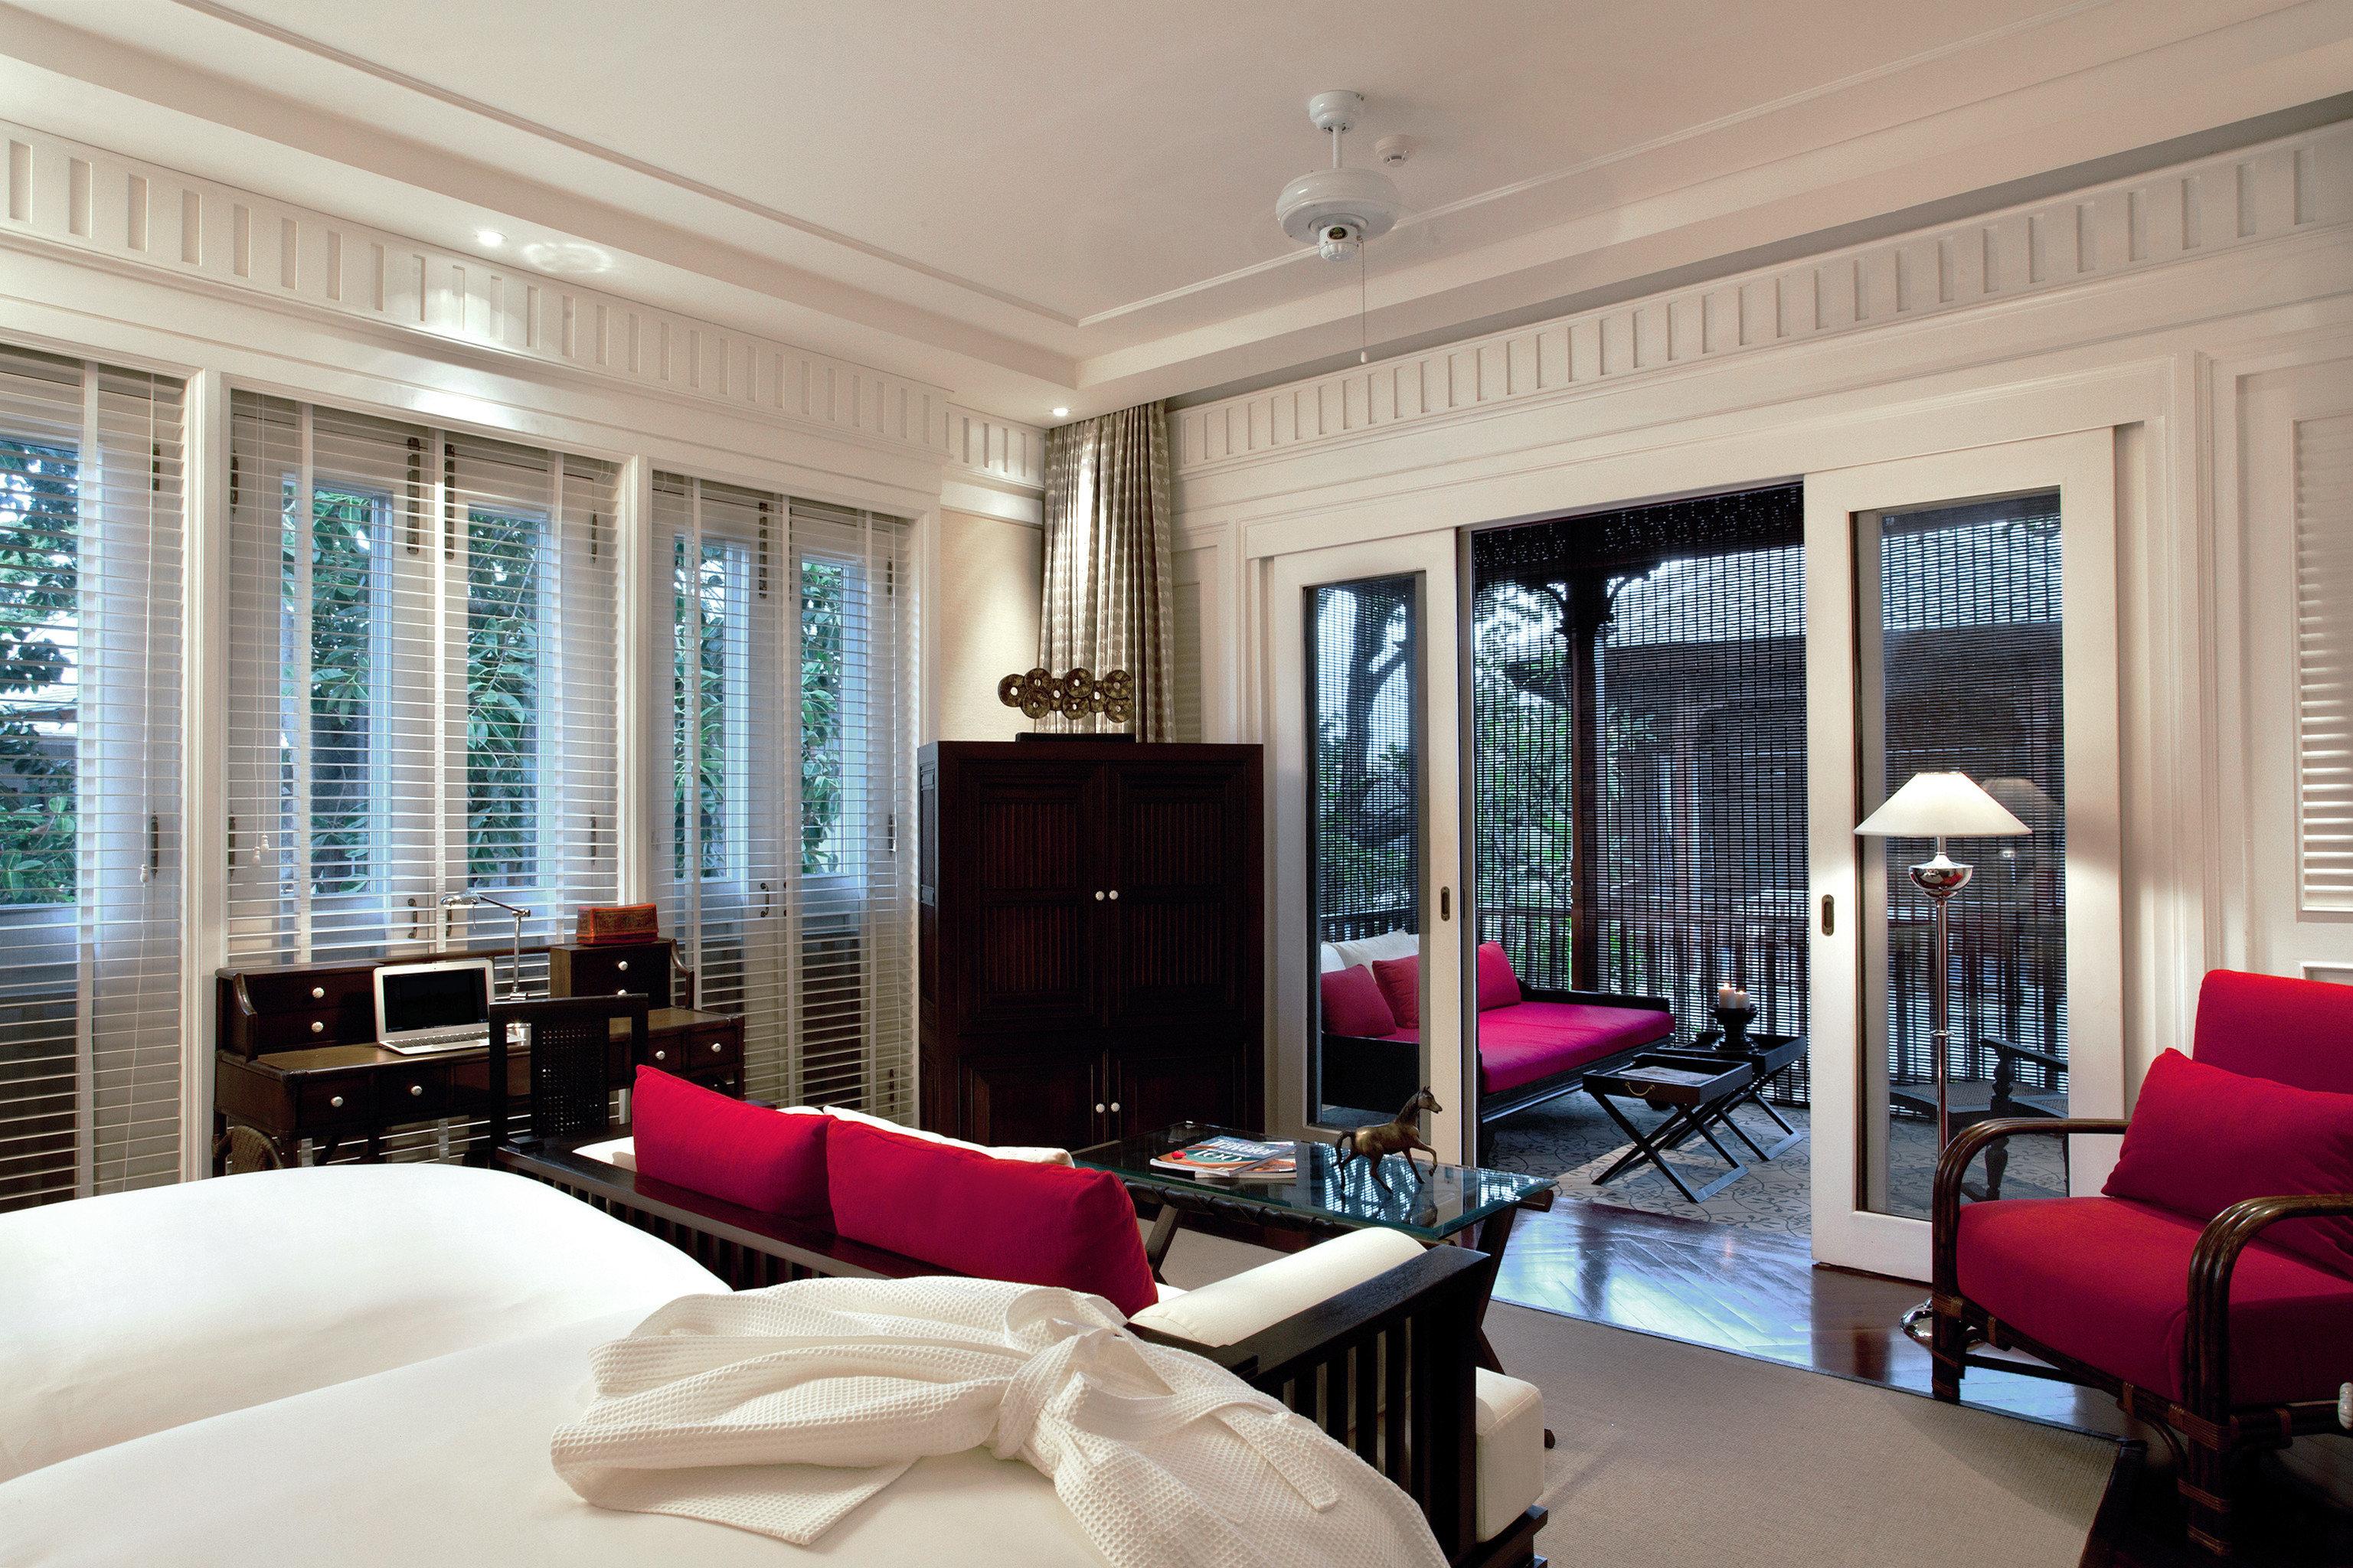 Bedroom Hip Luxury Modern Suite sofa property living room red condominium home mansion nice flat